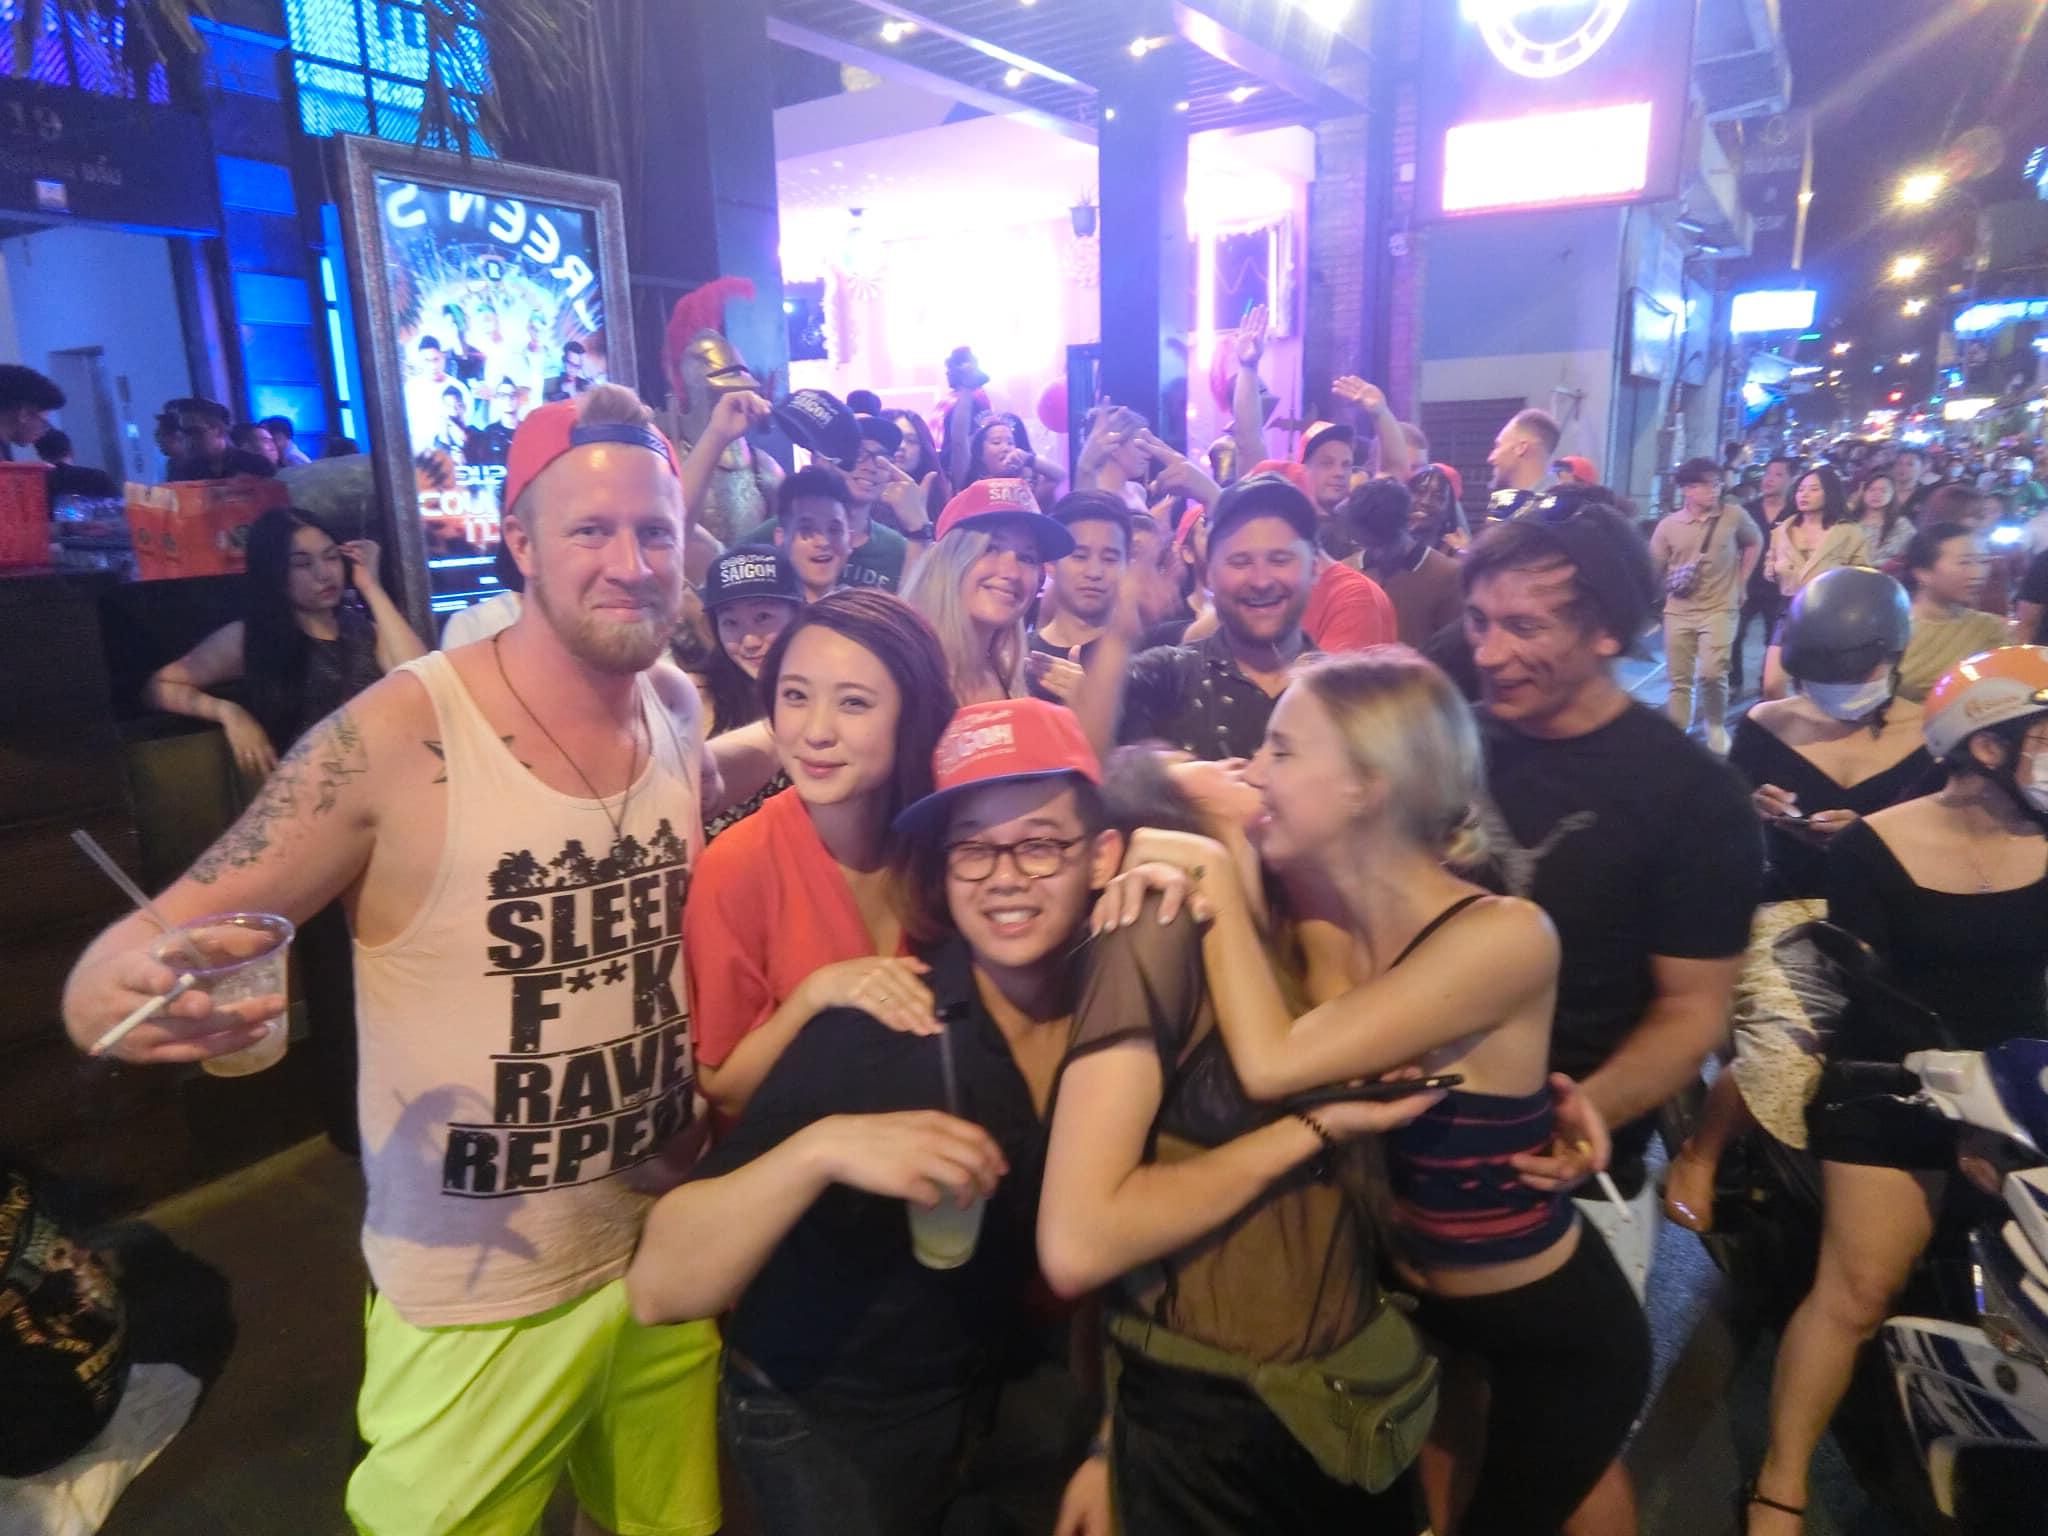 Pub crawls Saigon nightclub in Ho Chi Minh City